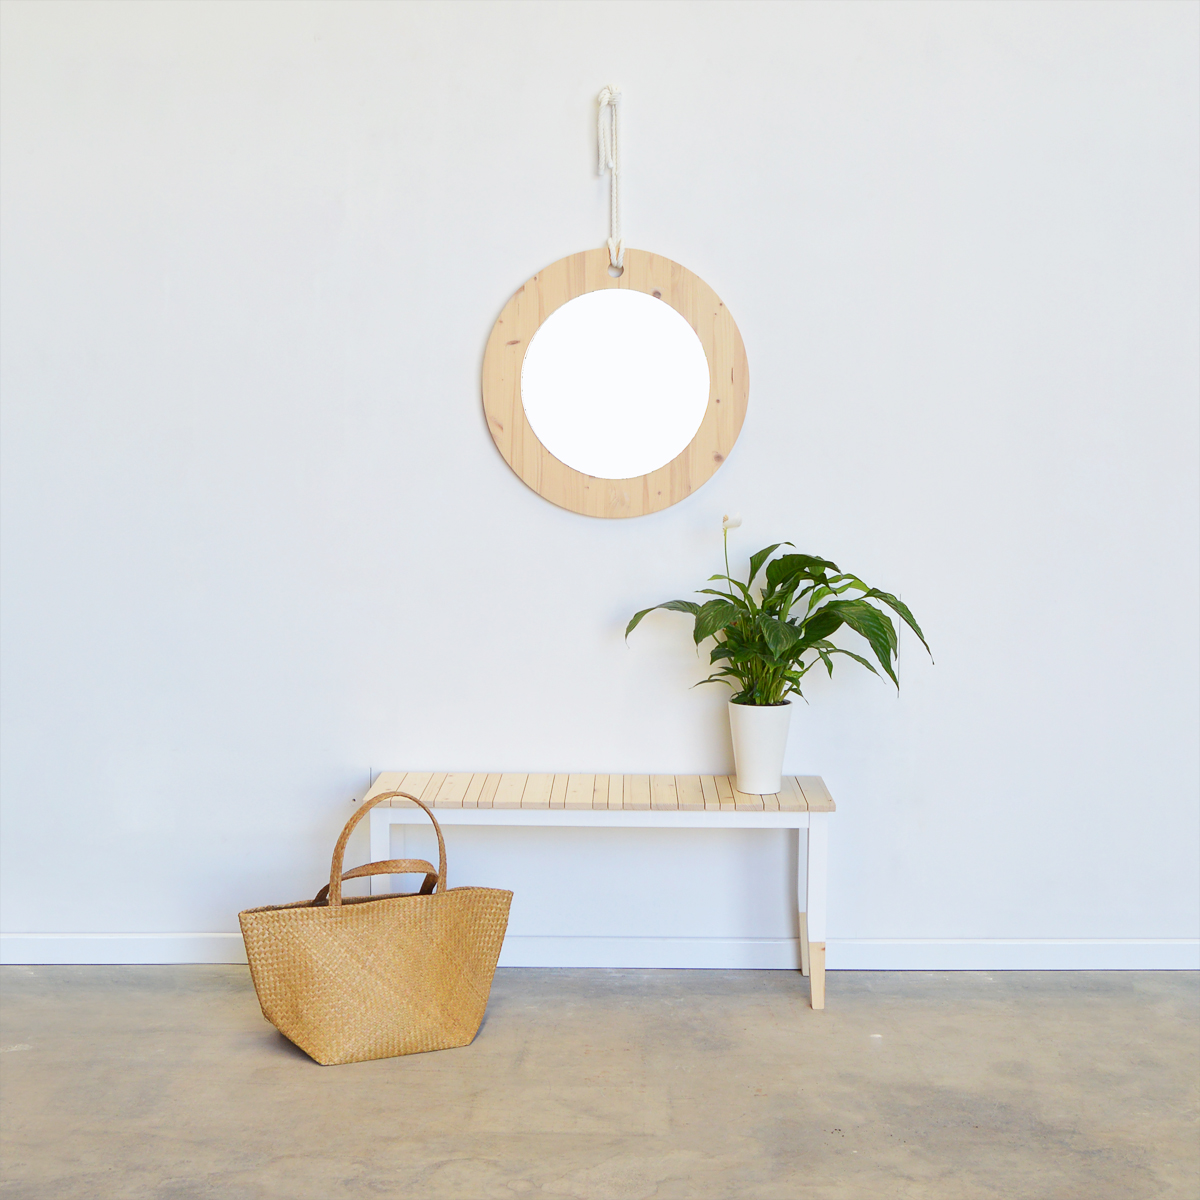 Espejo redondo estilo n rdico tienda online muebles - Espejo nordico ...